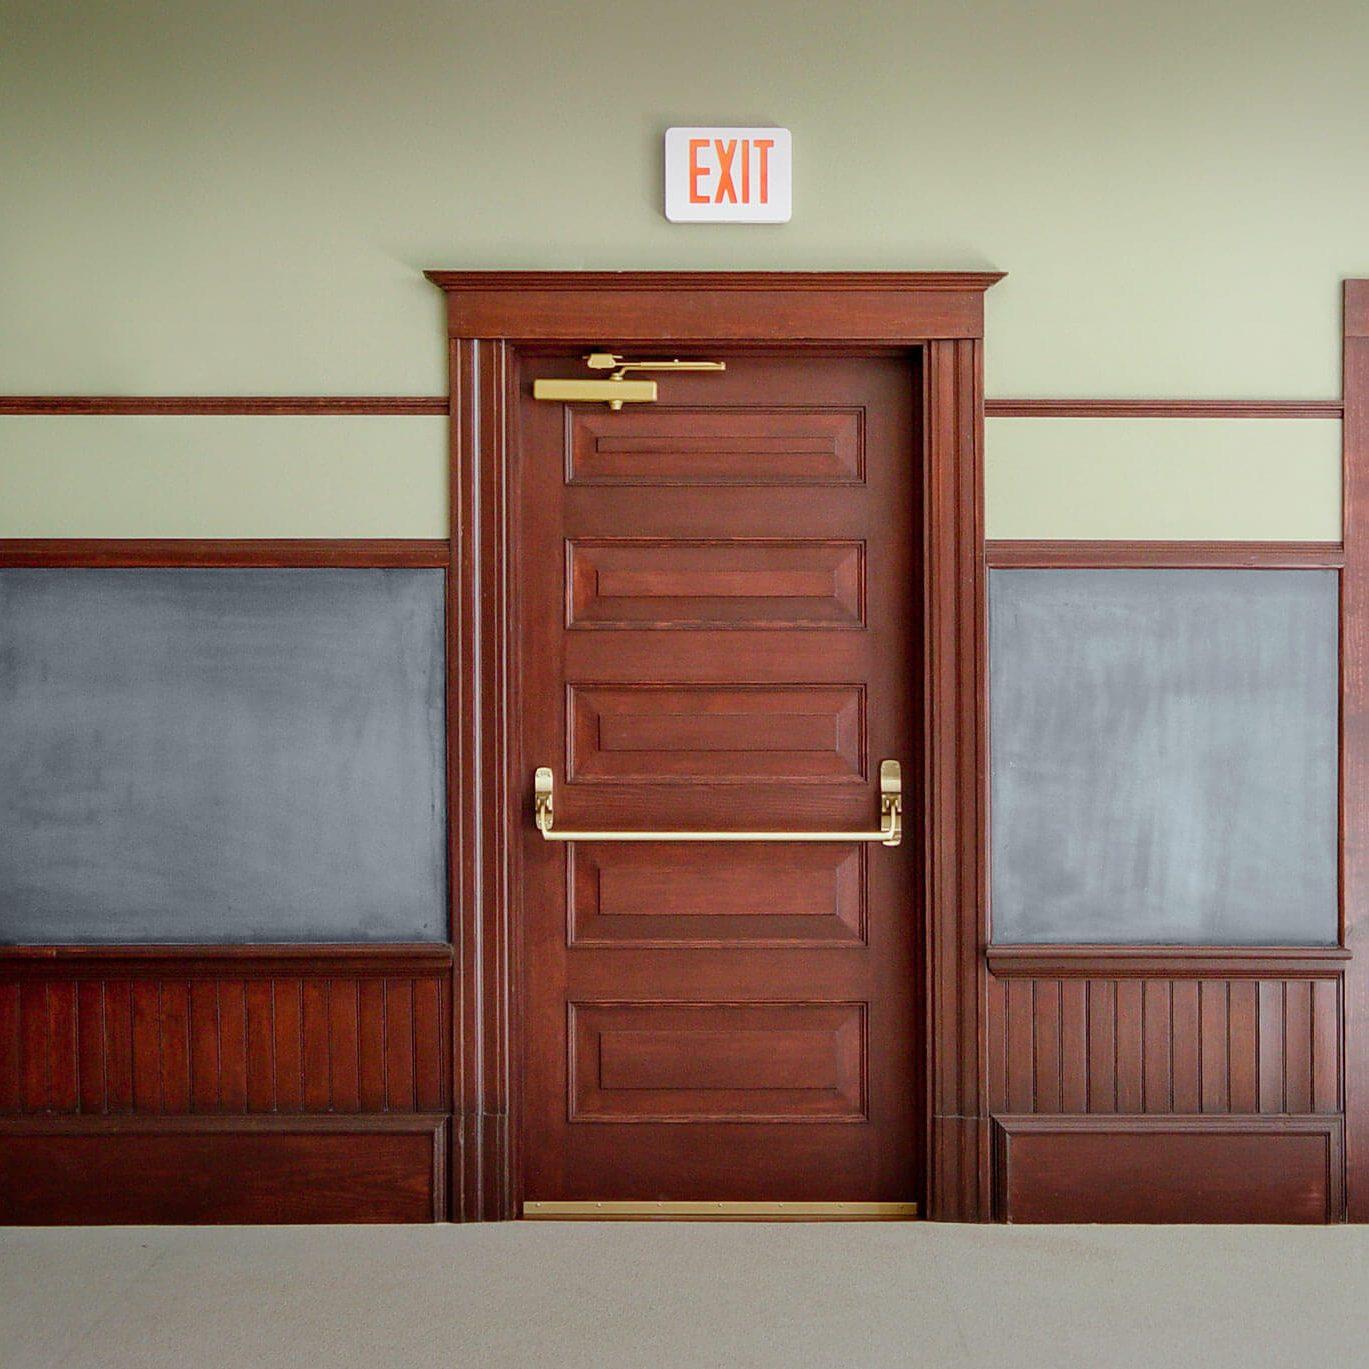 Photo of a commercial Captiva door